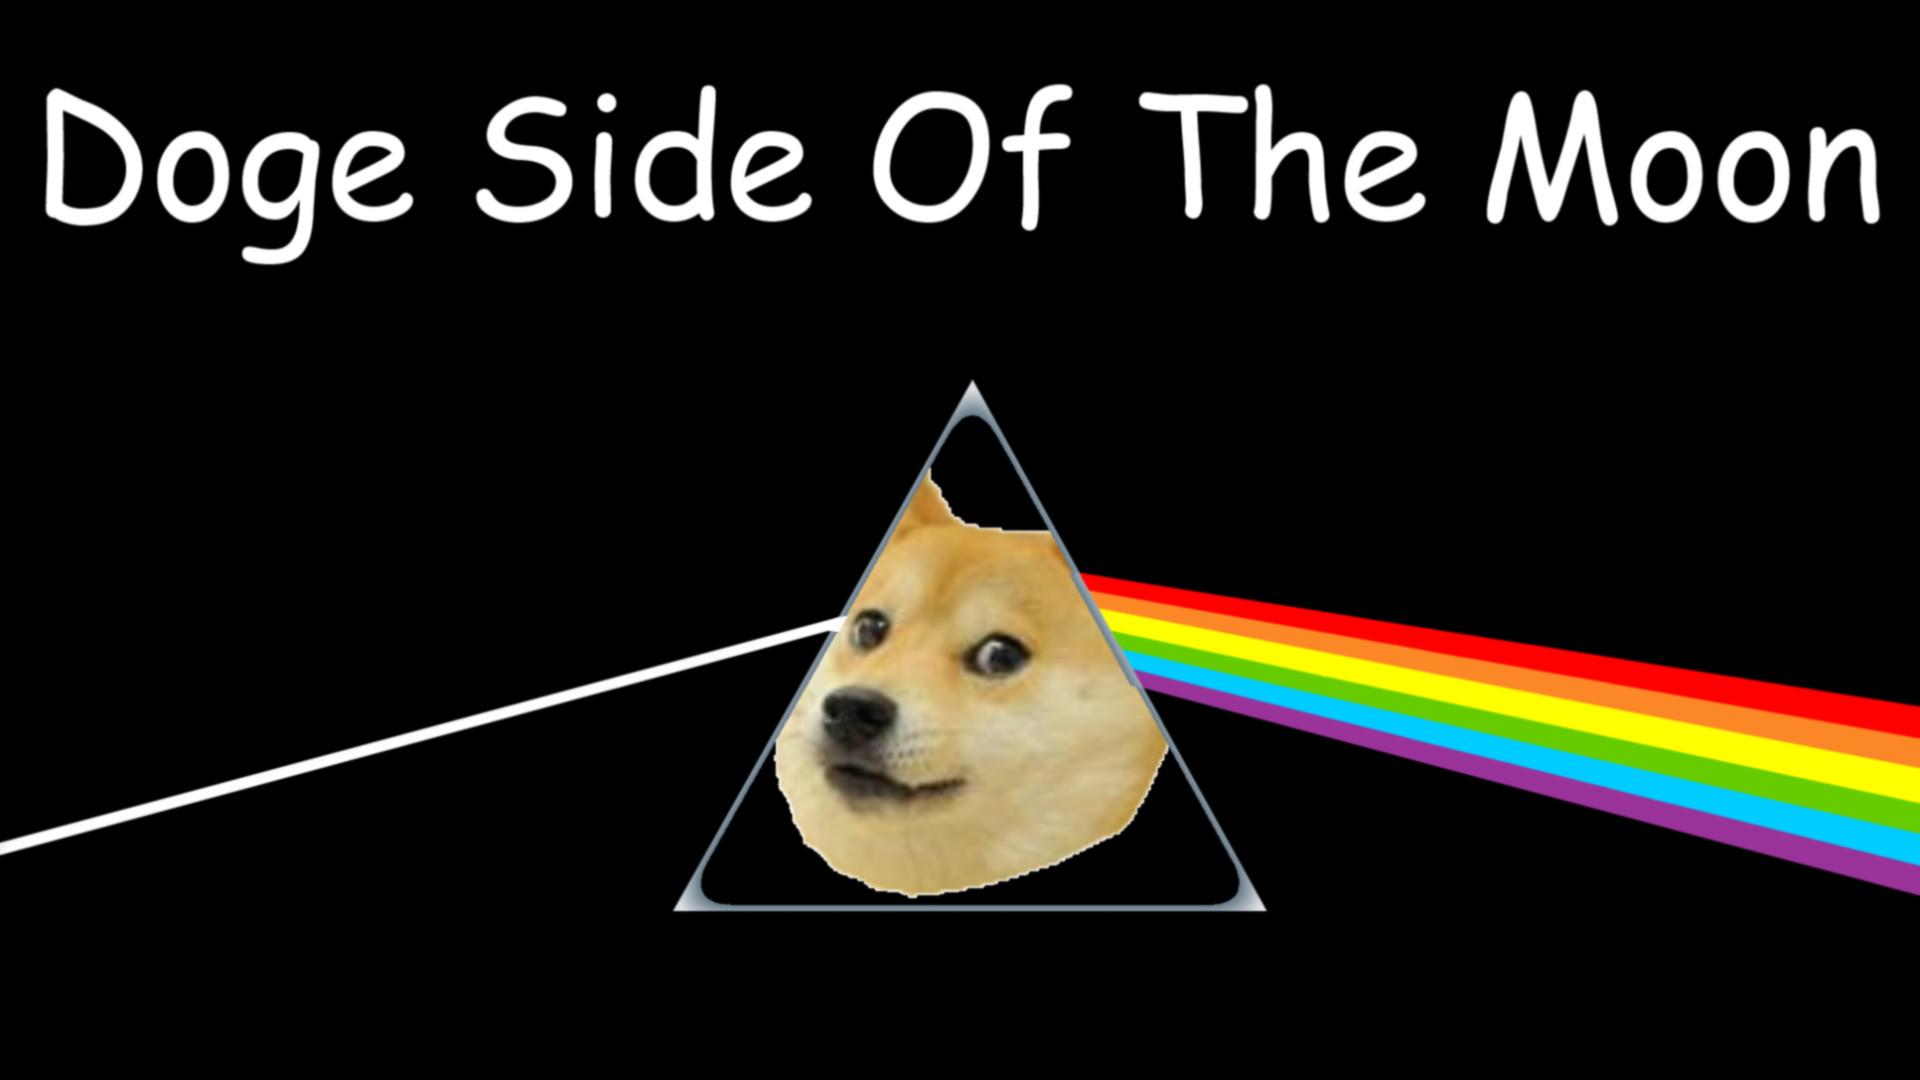 Doge Meme Wallpaper 1080P